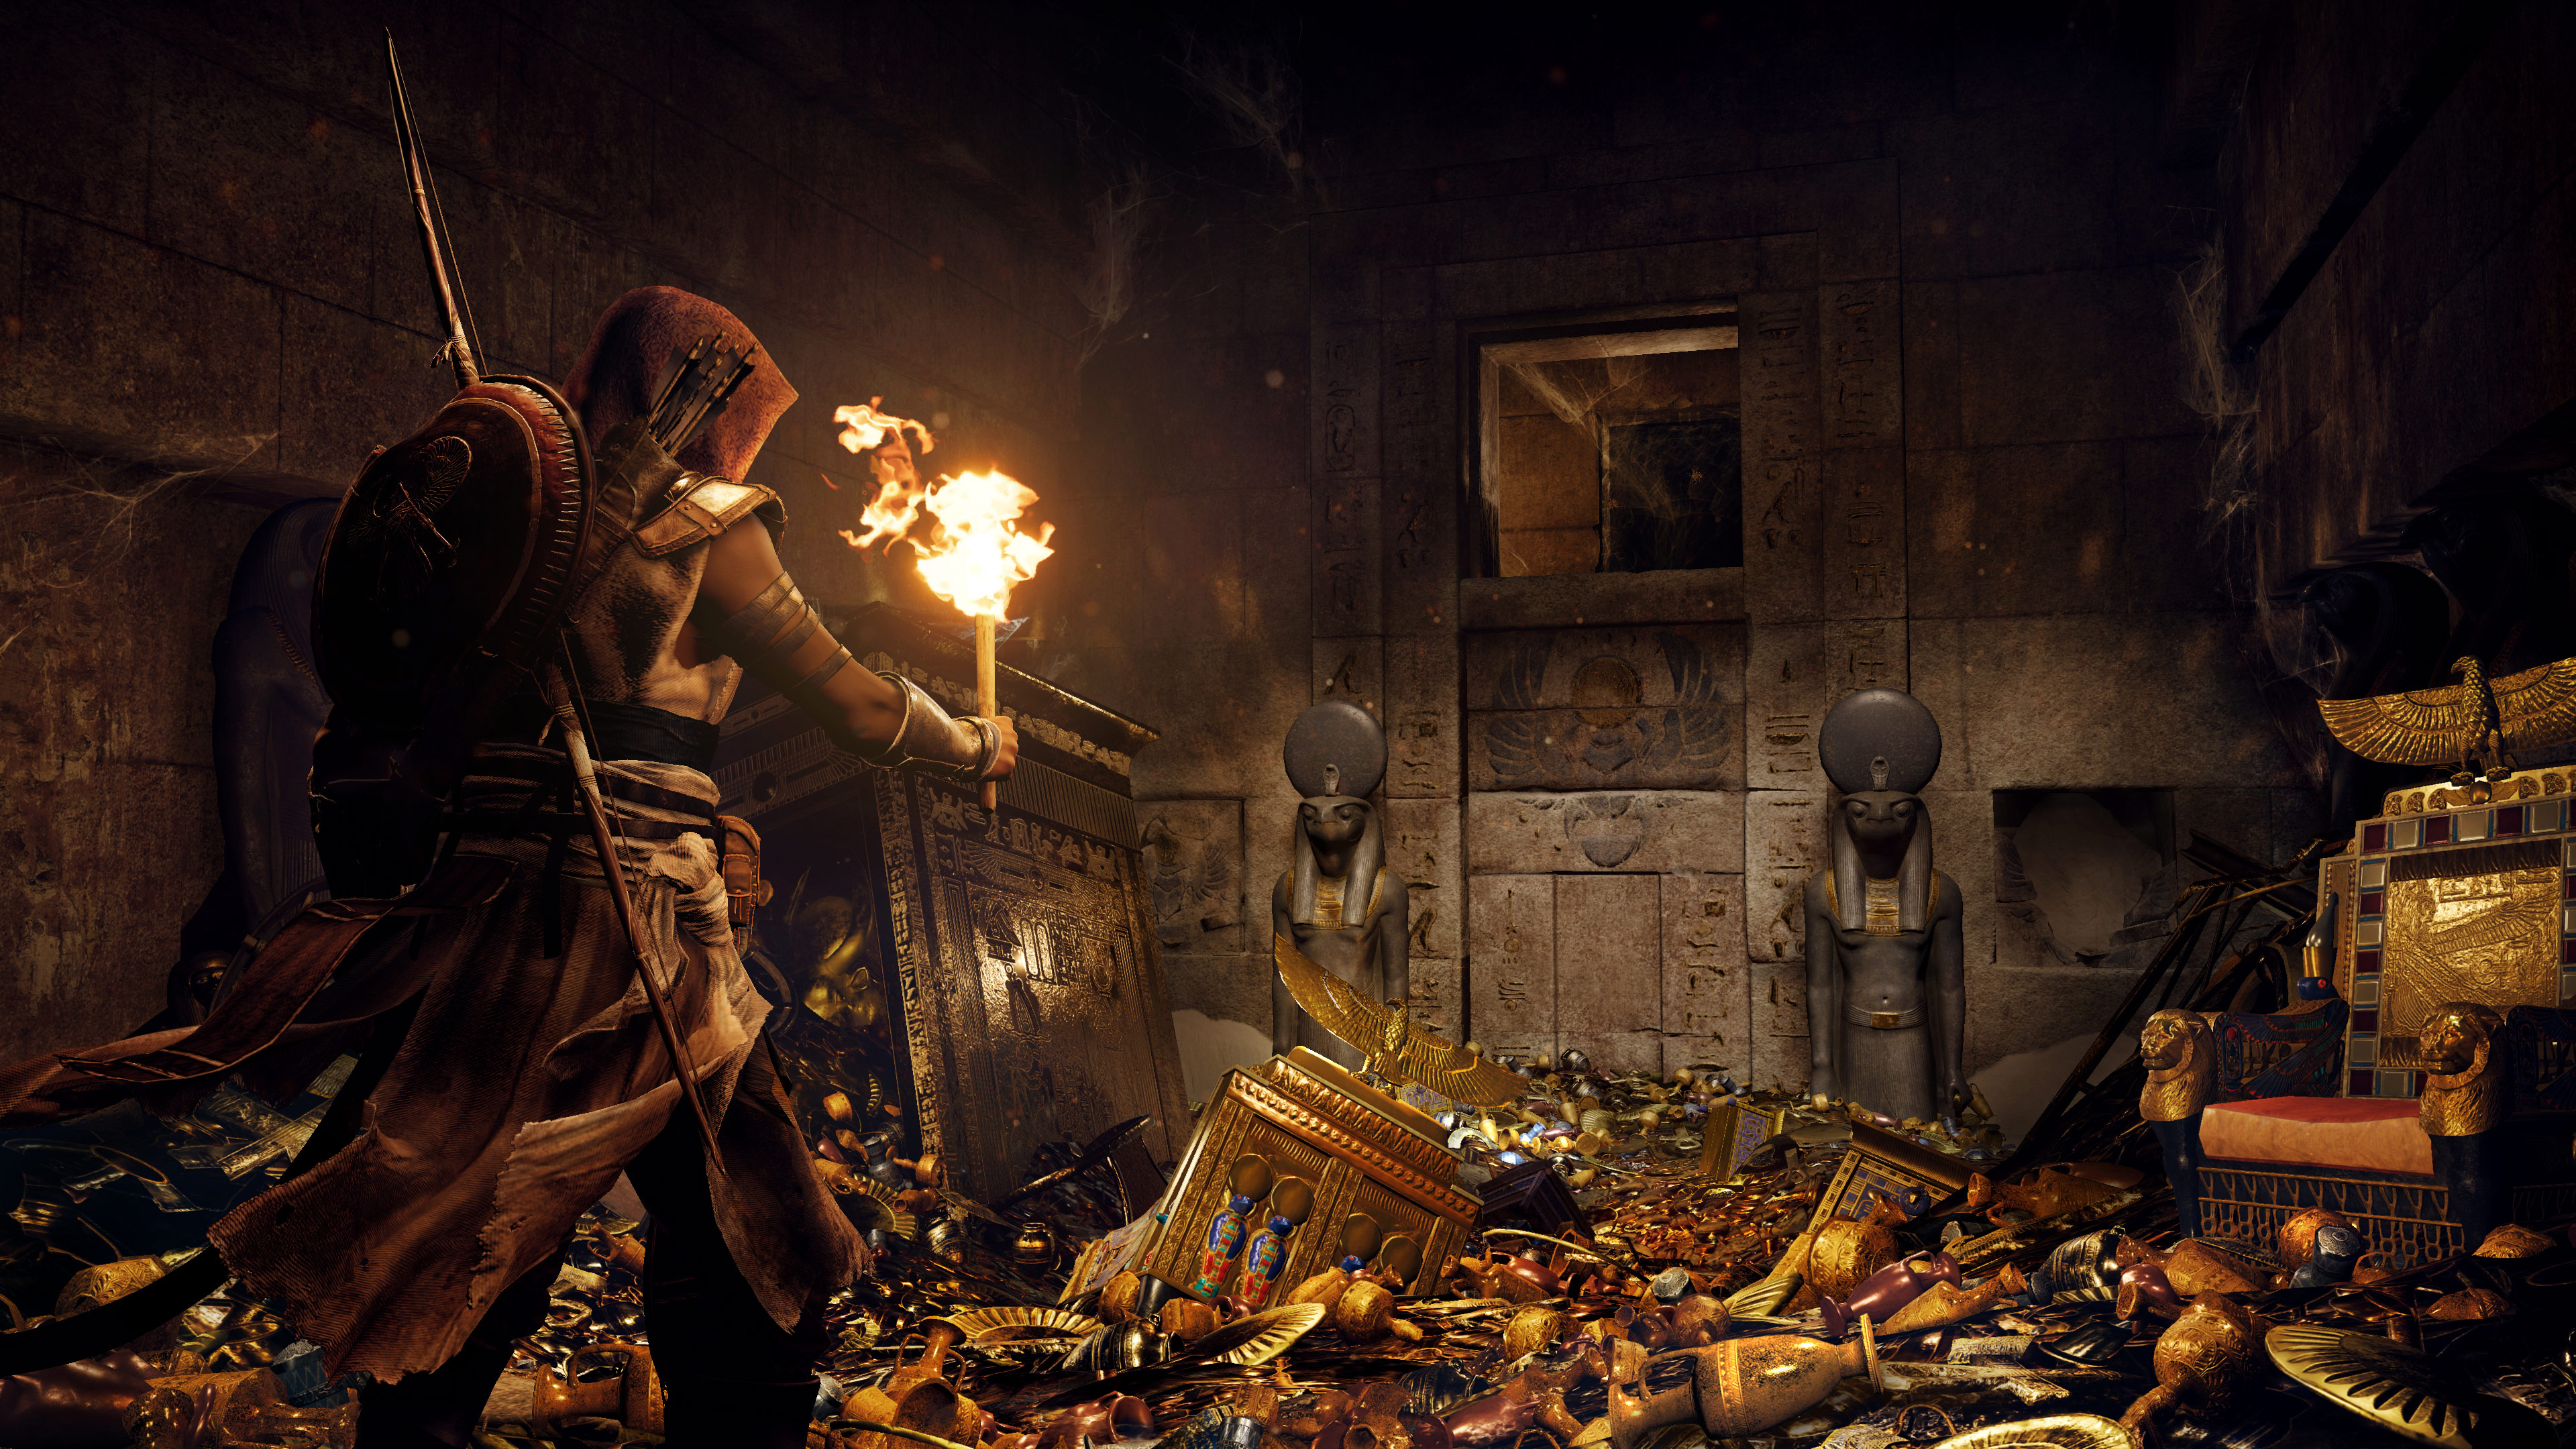 Bayek raids a treasure-filled tomb in Assassin's Creed Origins